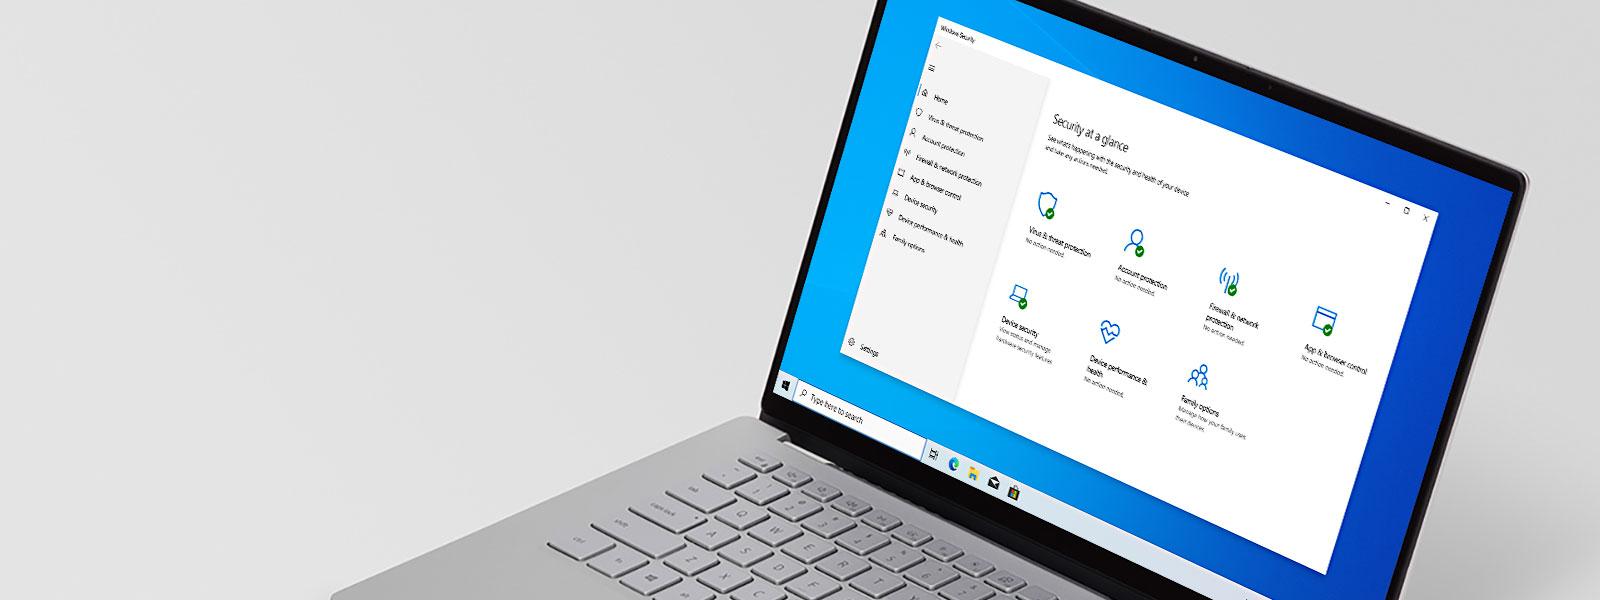 Windows 10 笔记本电脑显示 Microsoft Defender 防病毒窗口